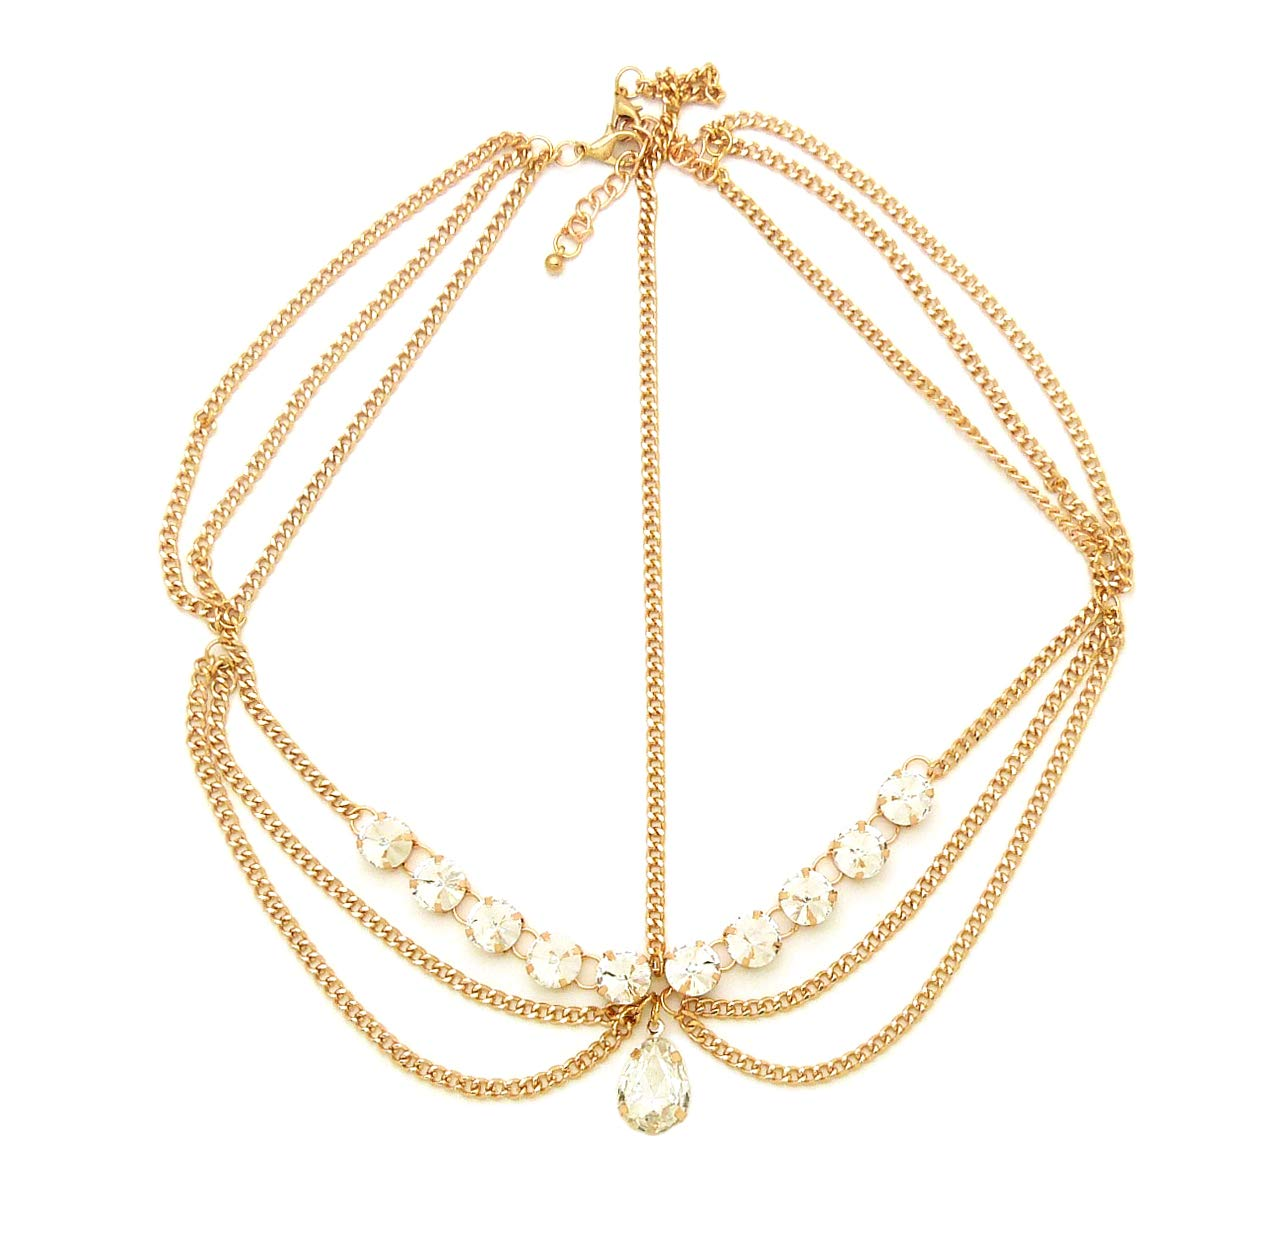 Gold Tone Womens Tear Drop Rhinestone Accent Head Chain Jewelry by Fashion 21